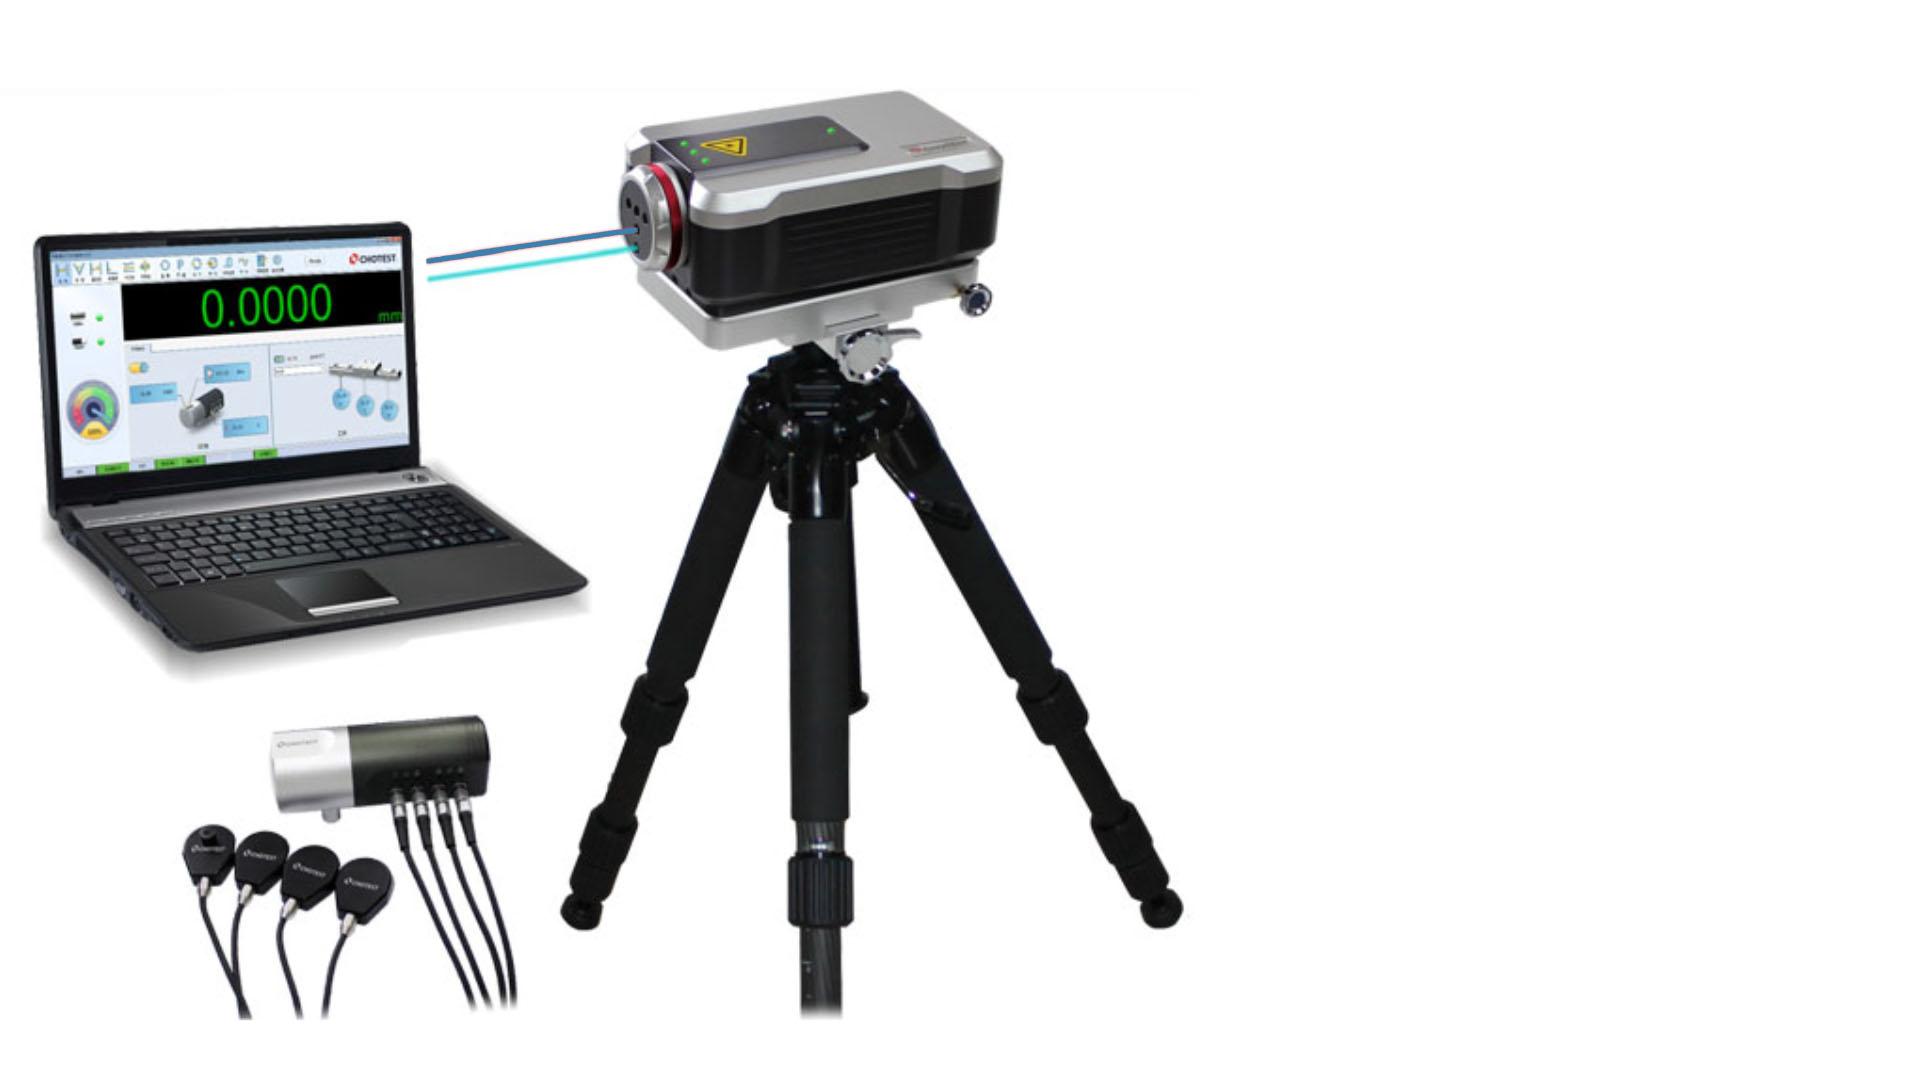 Micro Precision MP6000 Displacement Measurement | Laser Interferometer | Laser Interferometer Measurement System